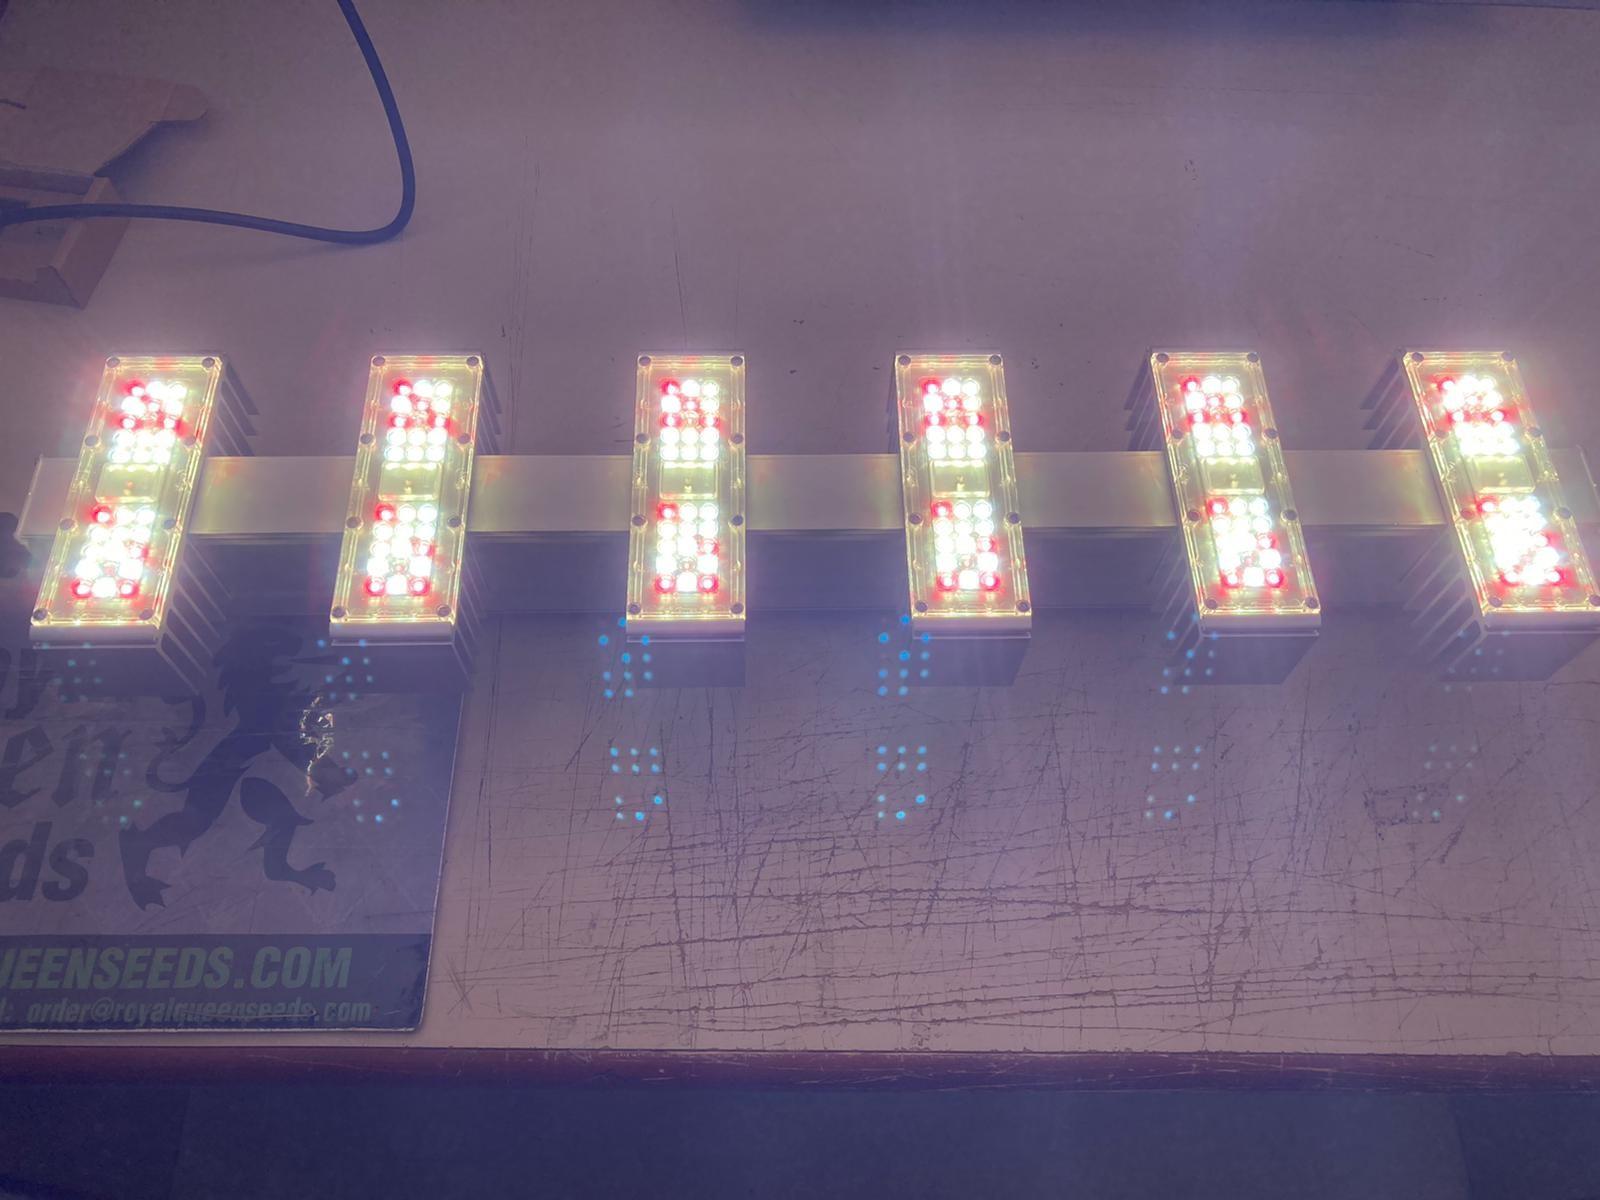 luminaria-led-sanlight-q6W- 8